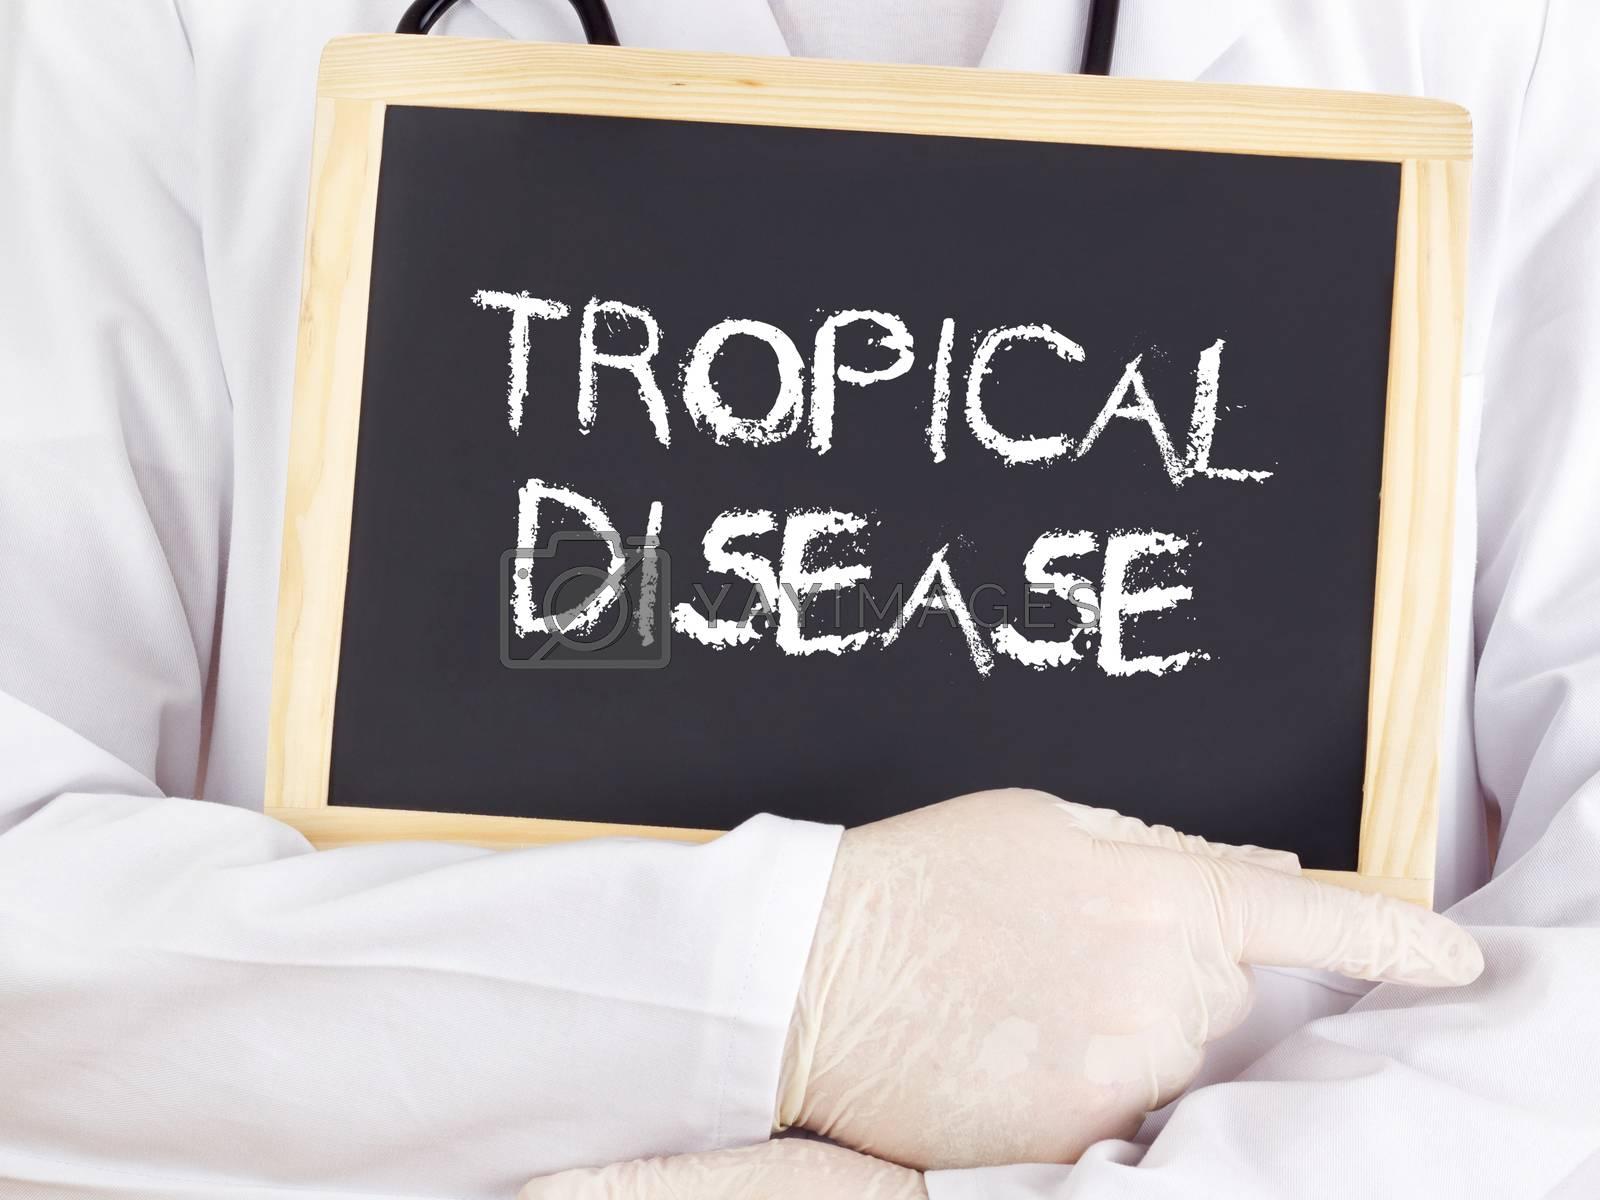 Doctor shows information on blackboard: Tropical disease